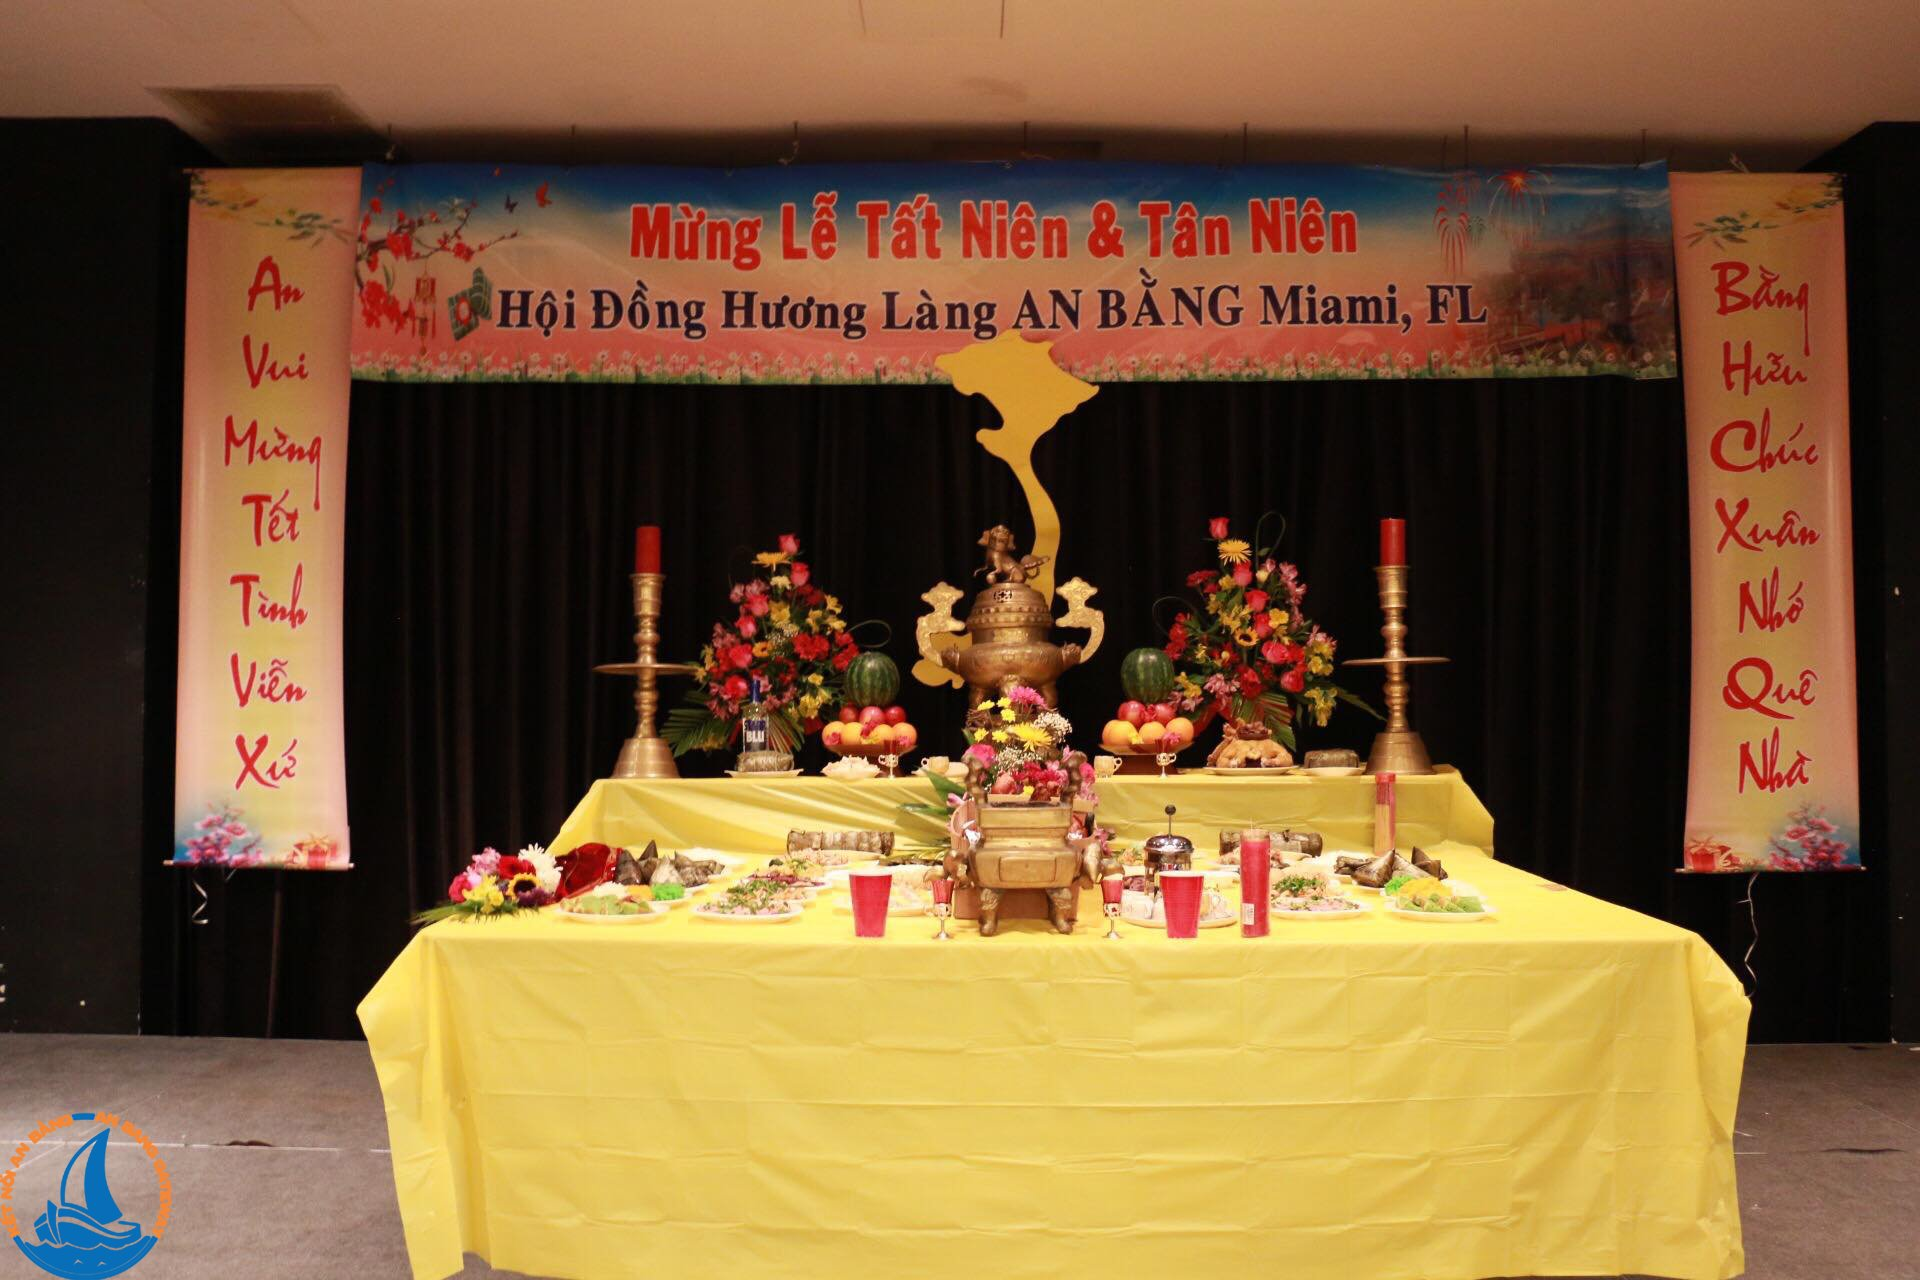 Mừng Lễ Tất Niên & Tân Niên